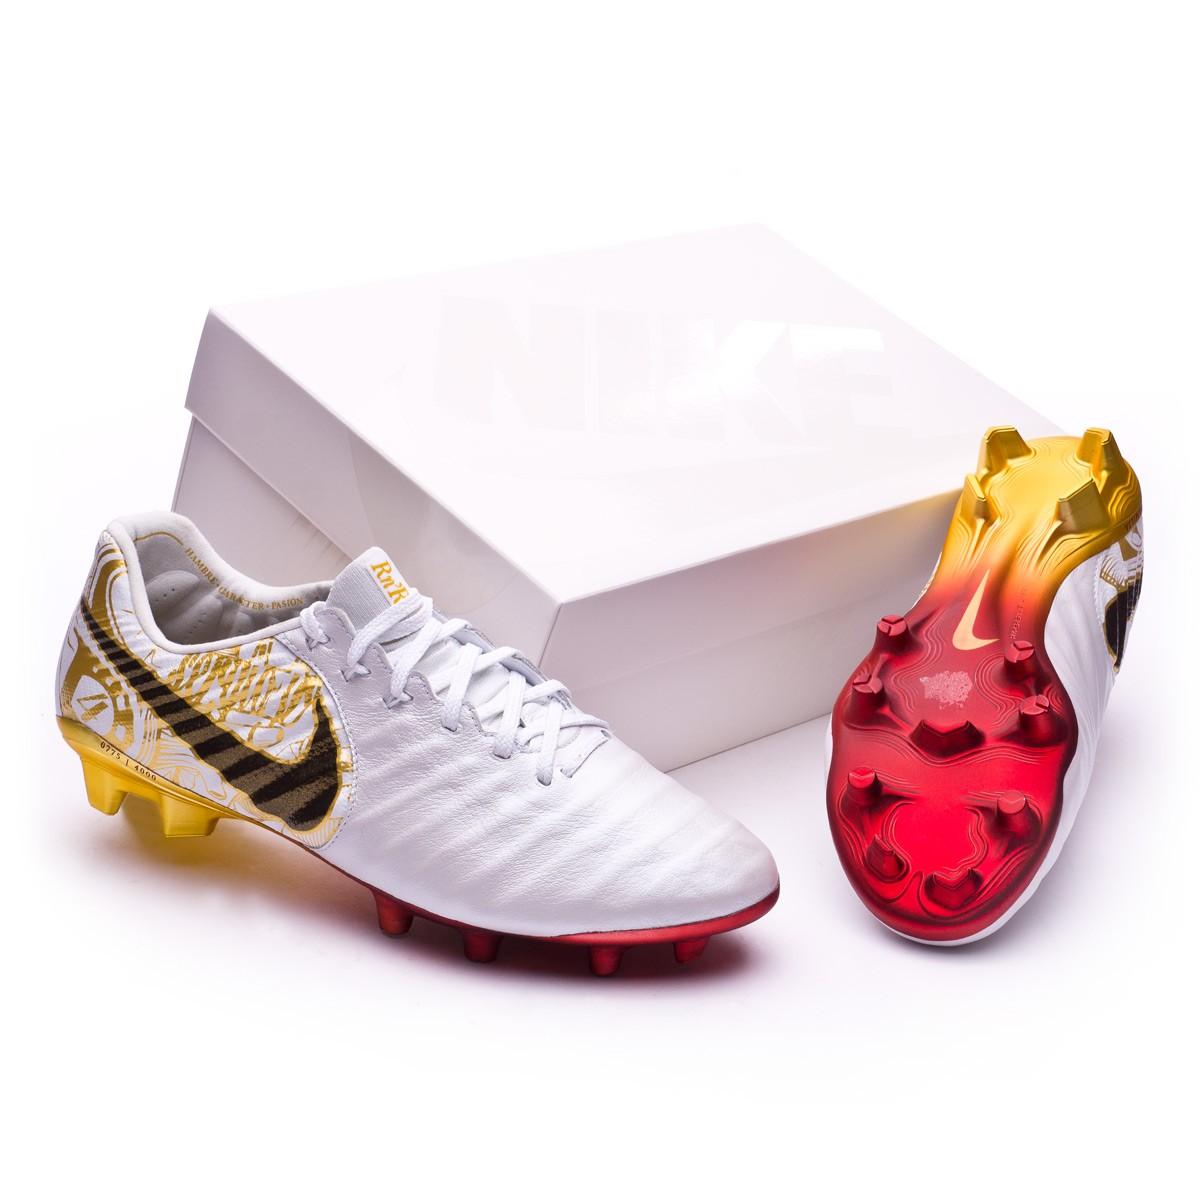 37a7c7290a46 Football Boots Nike Tiempo Legend VII SR4 FG White-Vivid gold ...